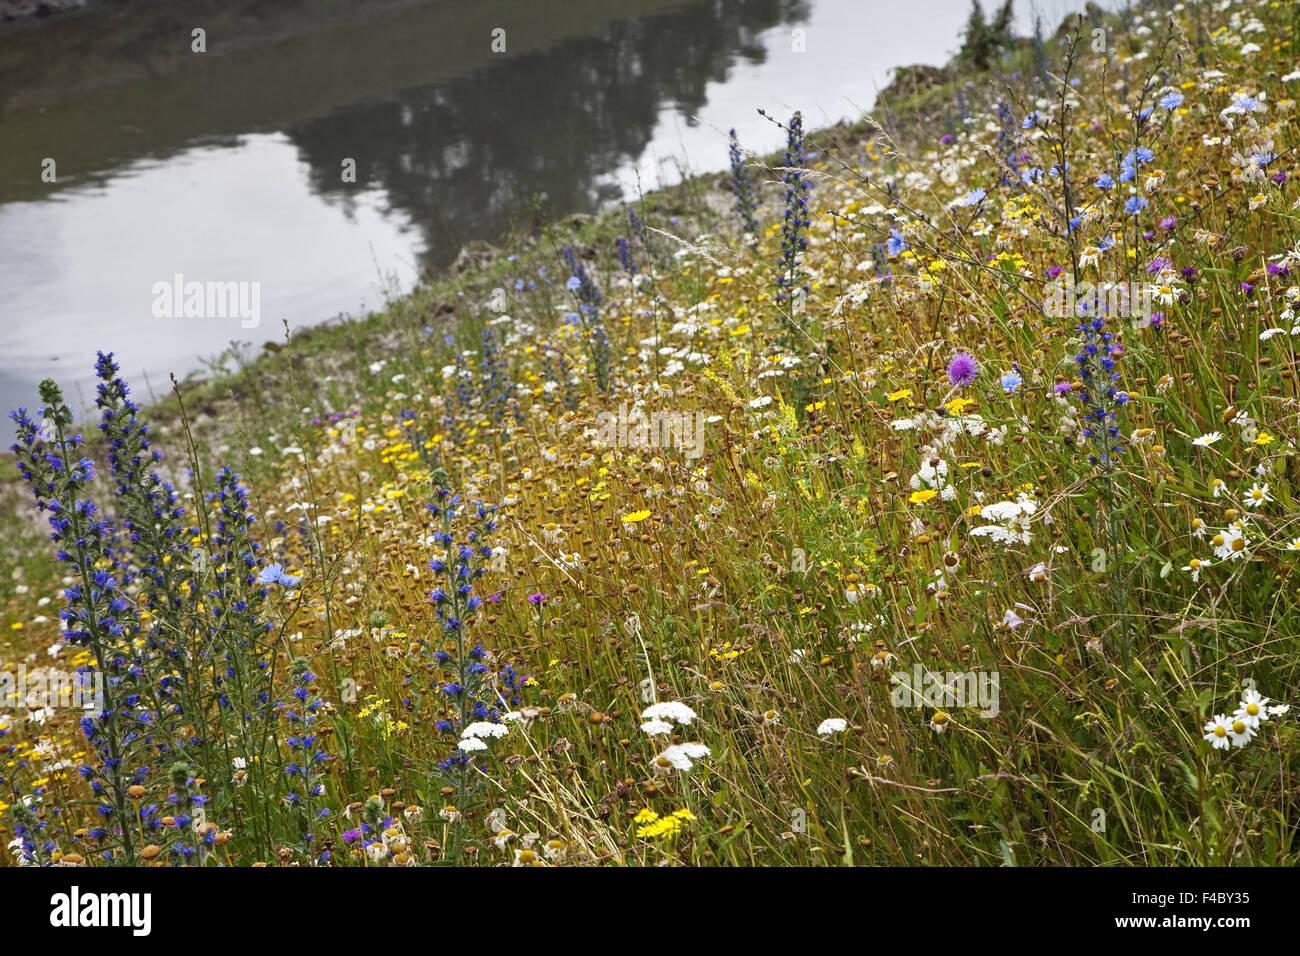 Wild flowers at the Emscher, Essen, Germany Stock Photo